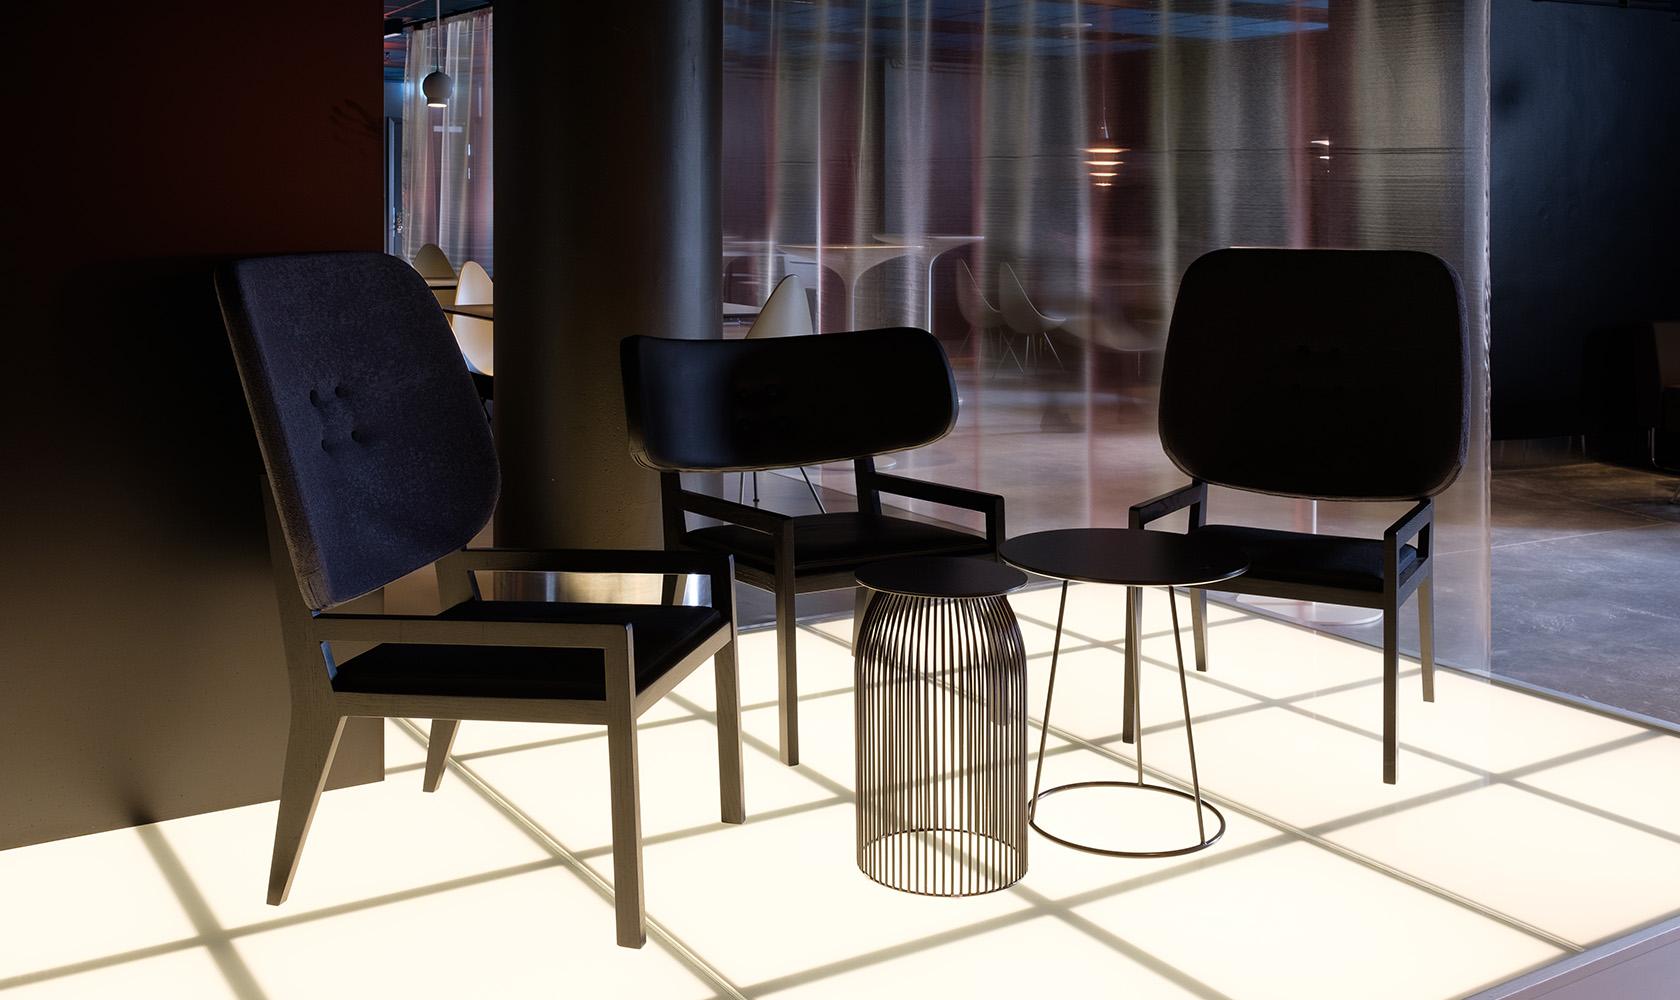 Tre stolar i en lounge